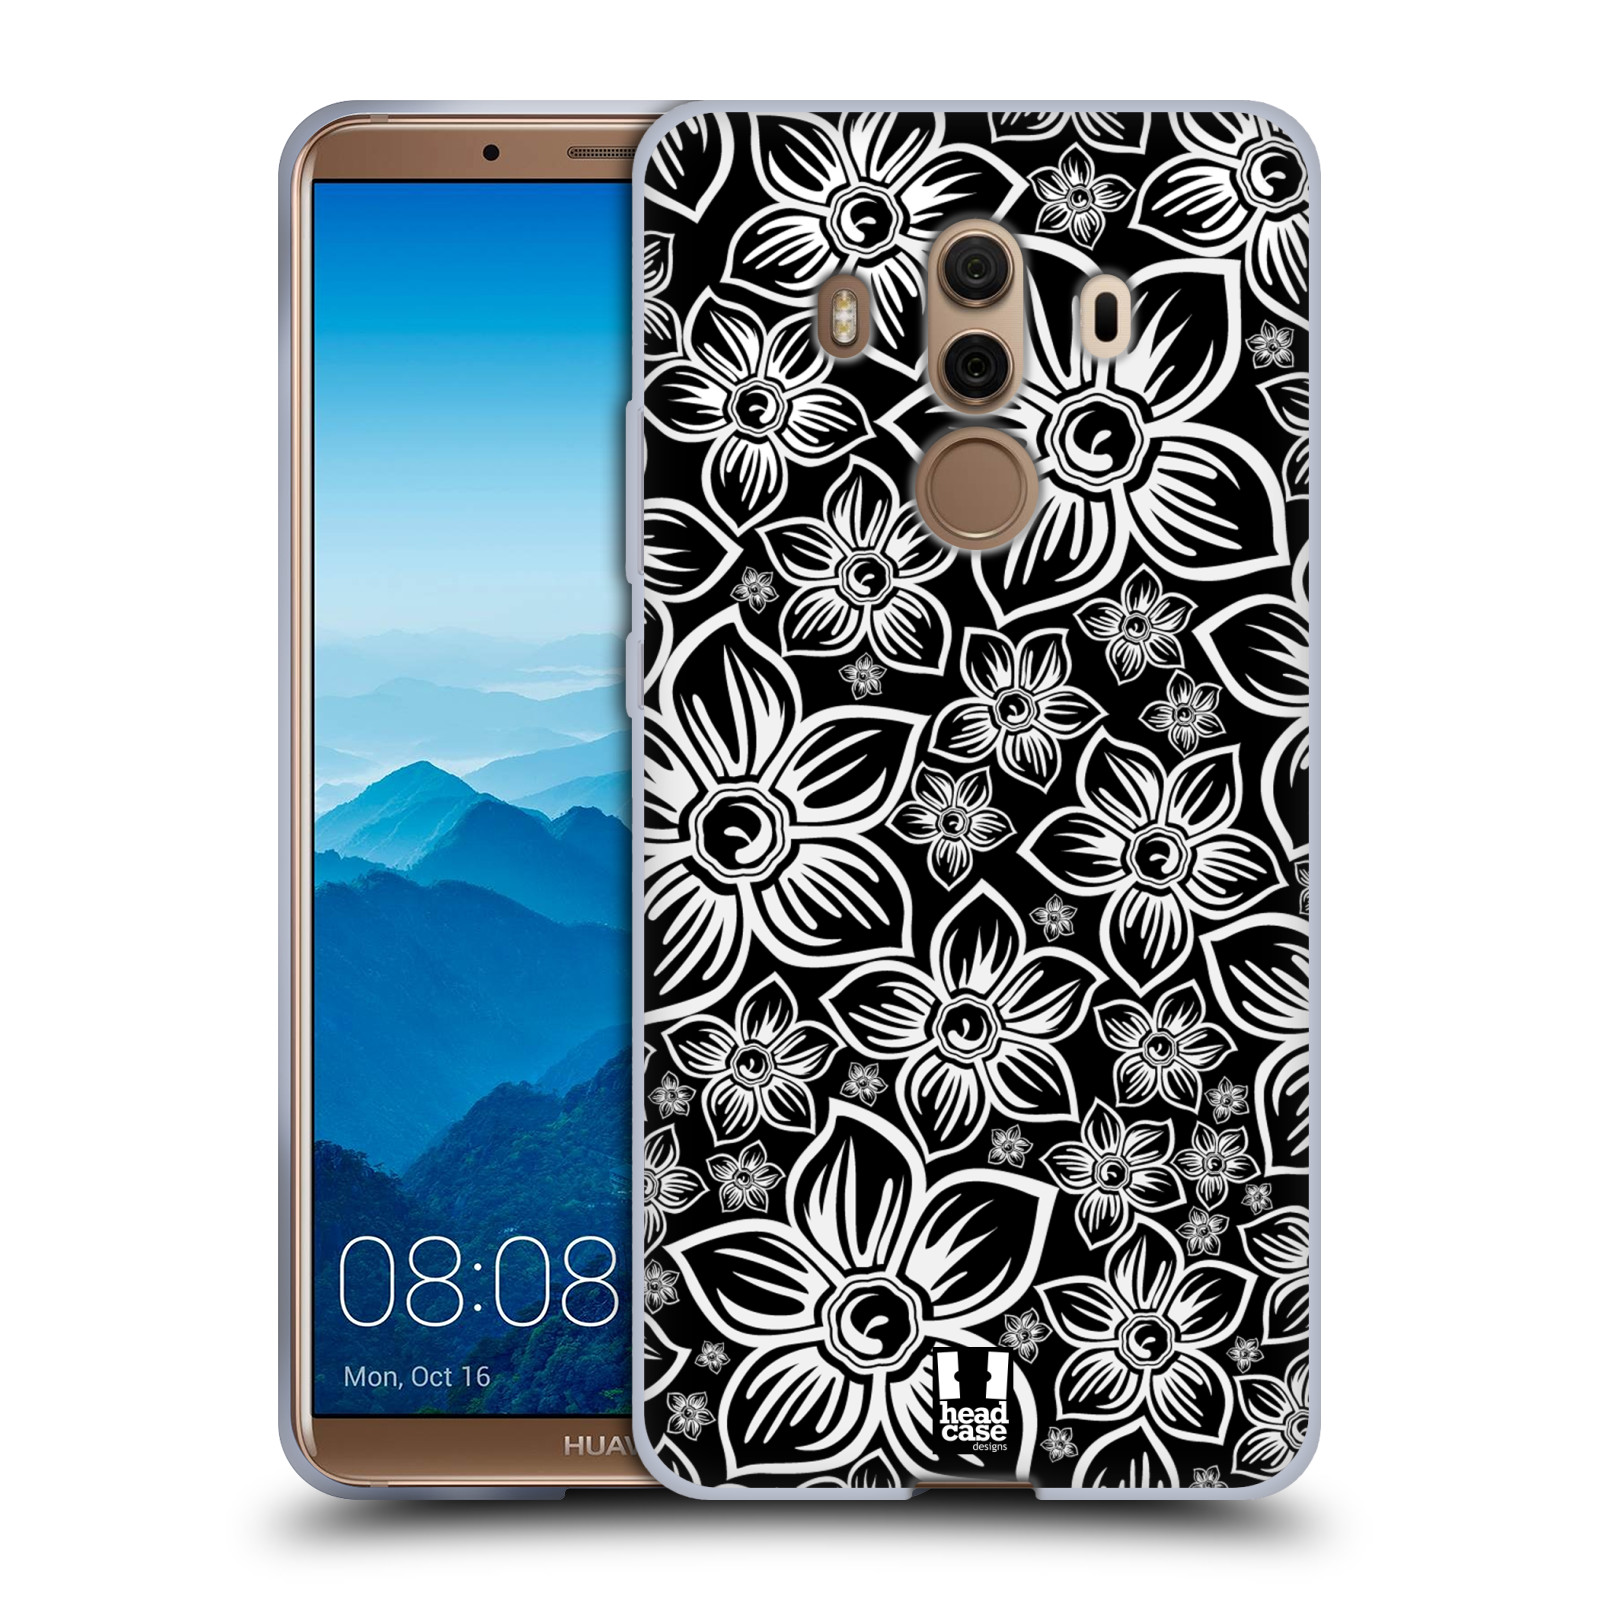 Silikonové pouzdro na mobil Huawei Mate 10 Pro - Head Case - FLORAL DAISY